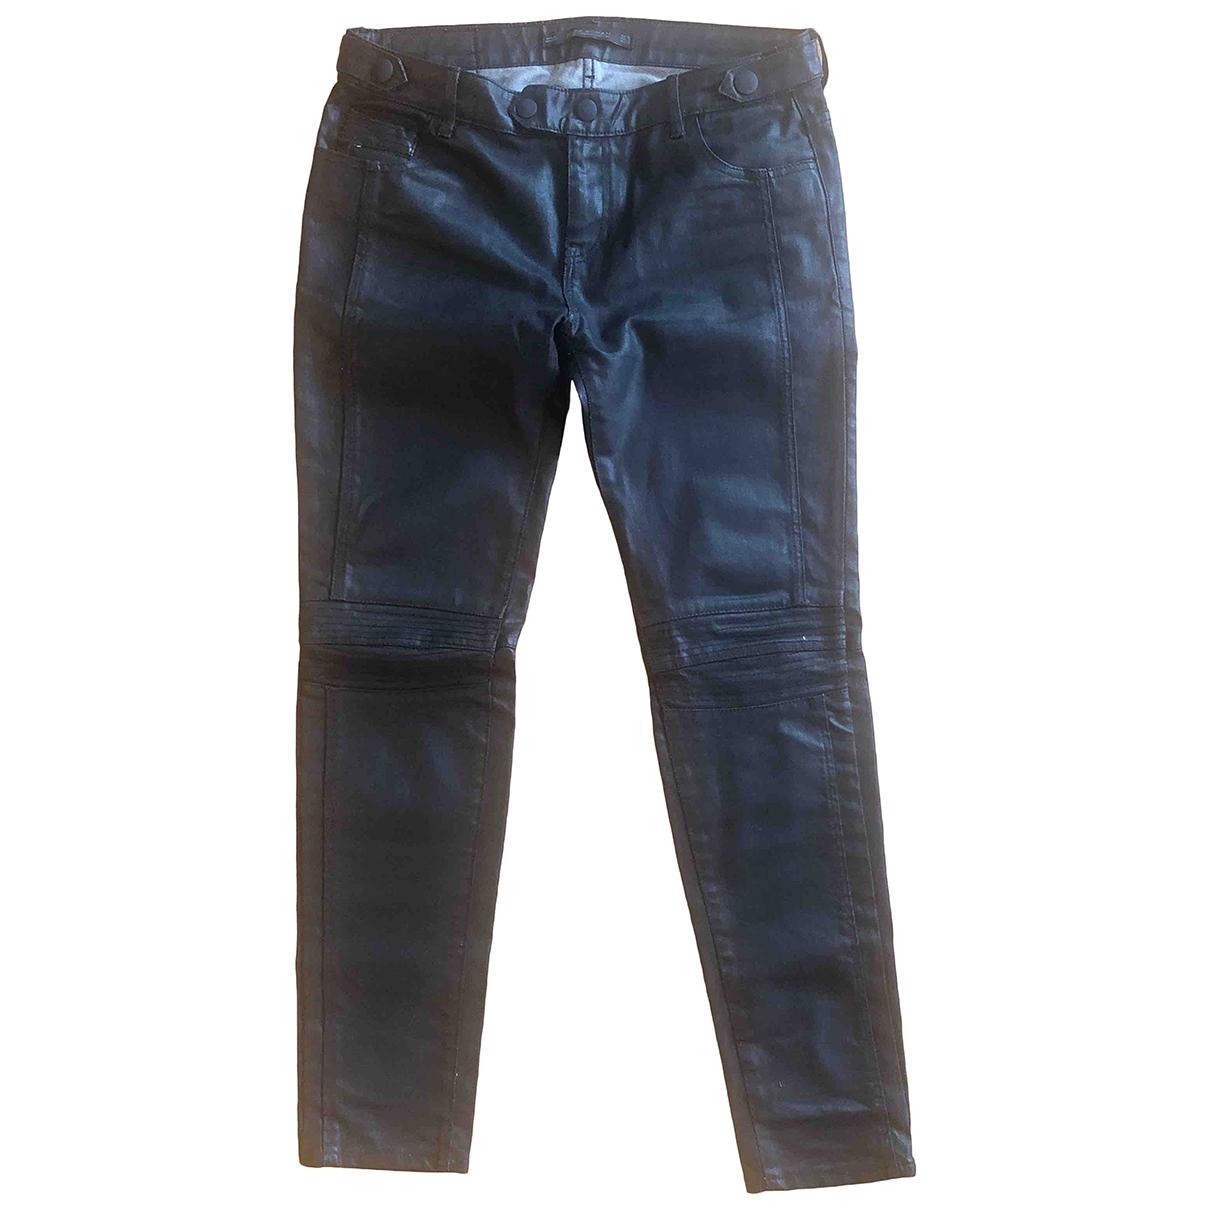 Zara \N Black Cotton - elasthane Jeans for Women 28 US